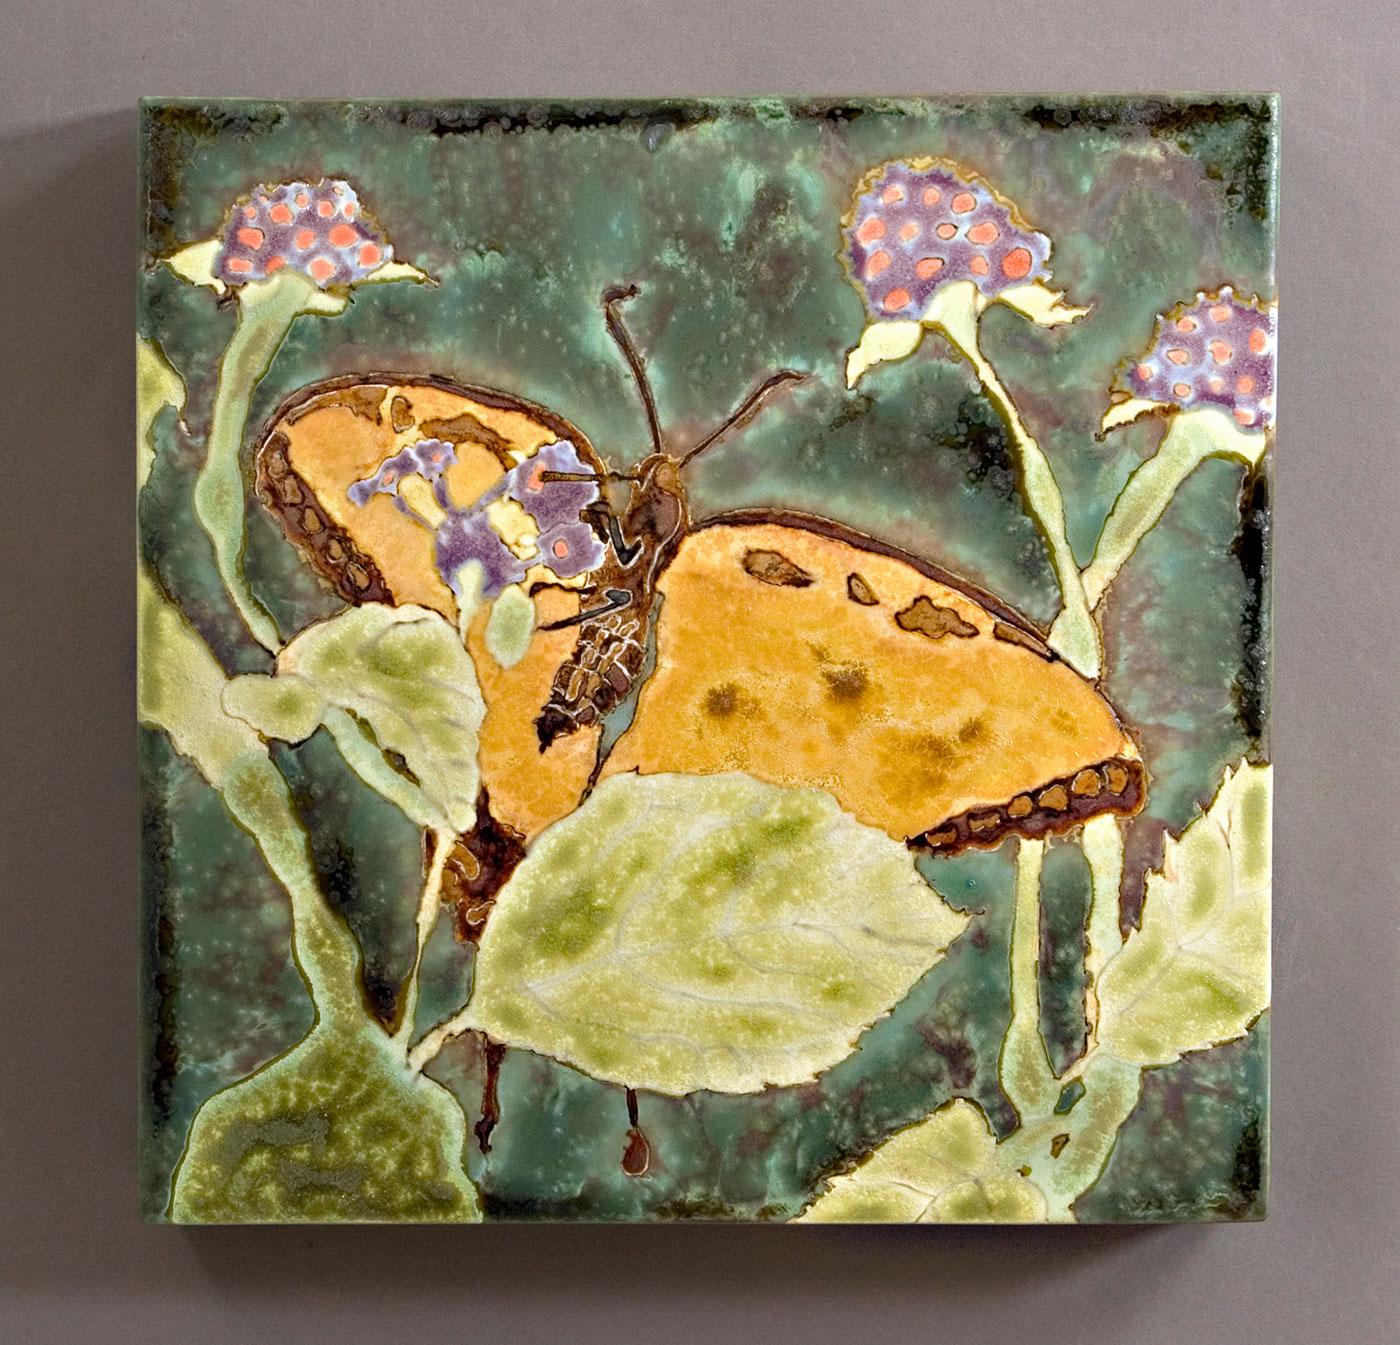 Butterfly-Glaze-Painting-Porcelain-Samantha-Henneke.jpg